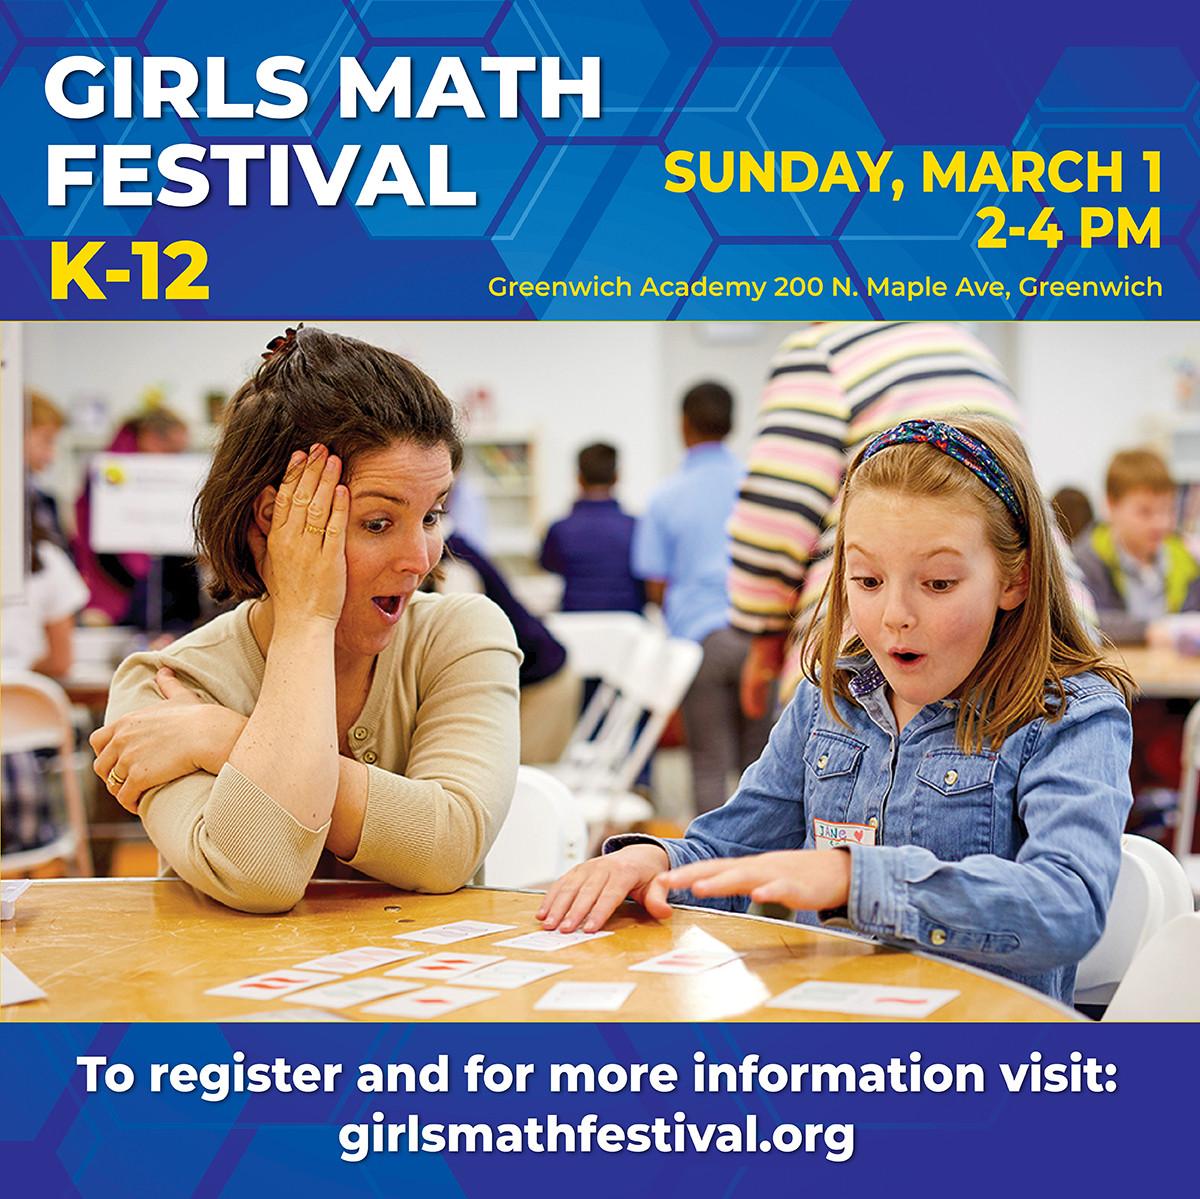 Greenwich Girls Math Festival (K-12)